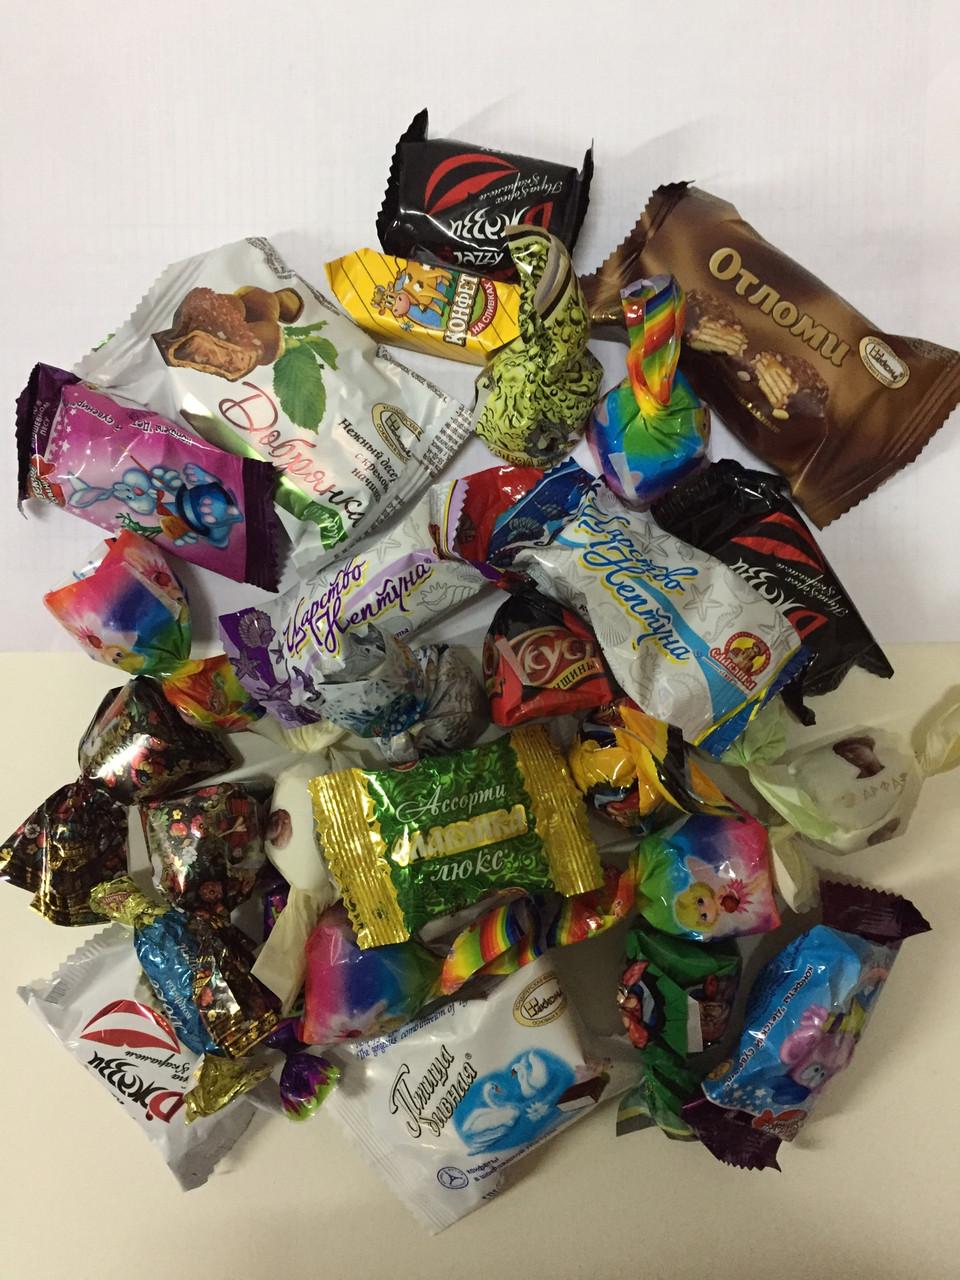 Набор конфет 500г (Атаг, Акконд, Славянка...)